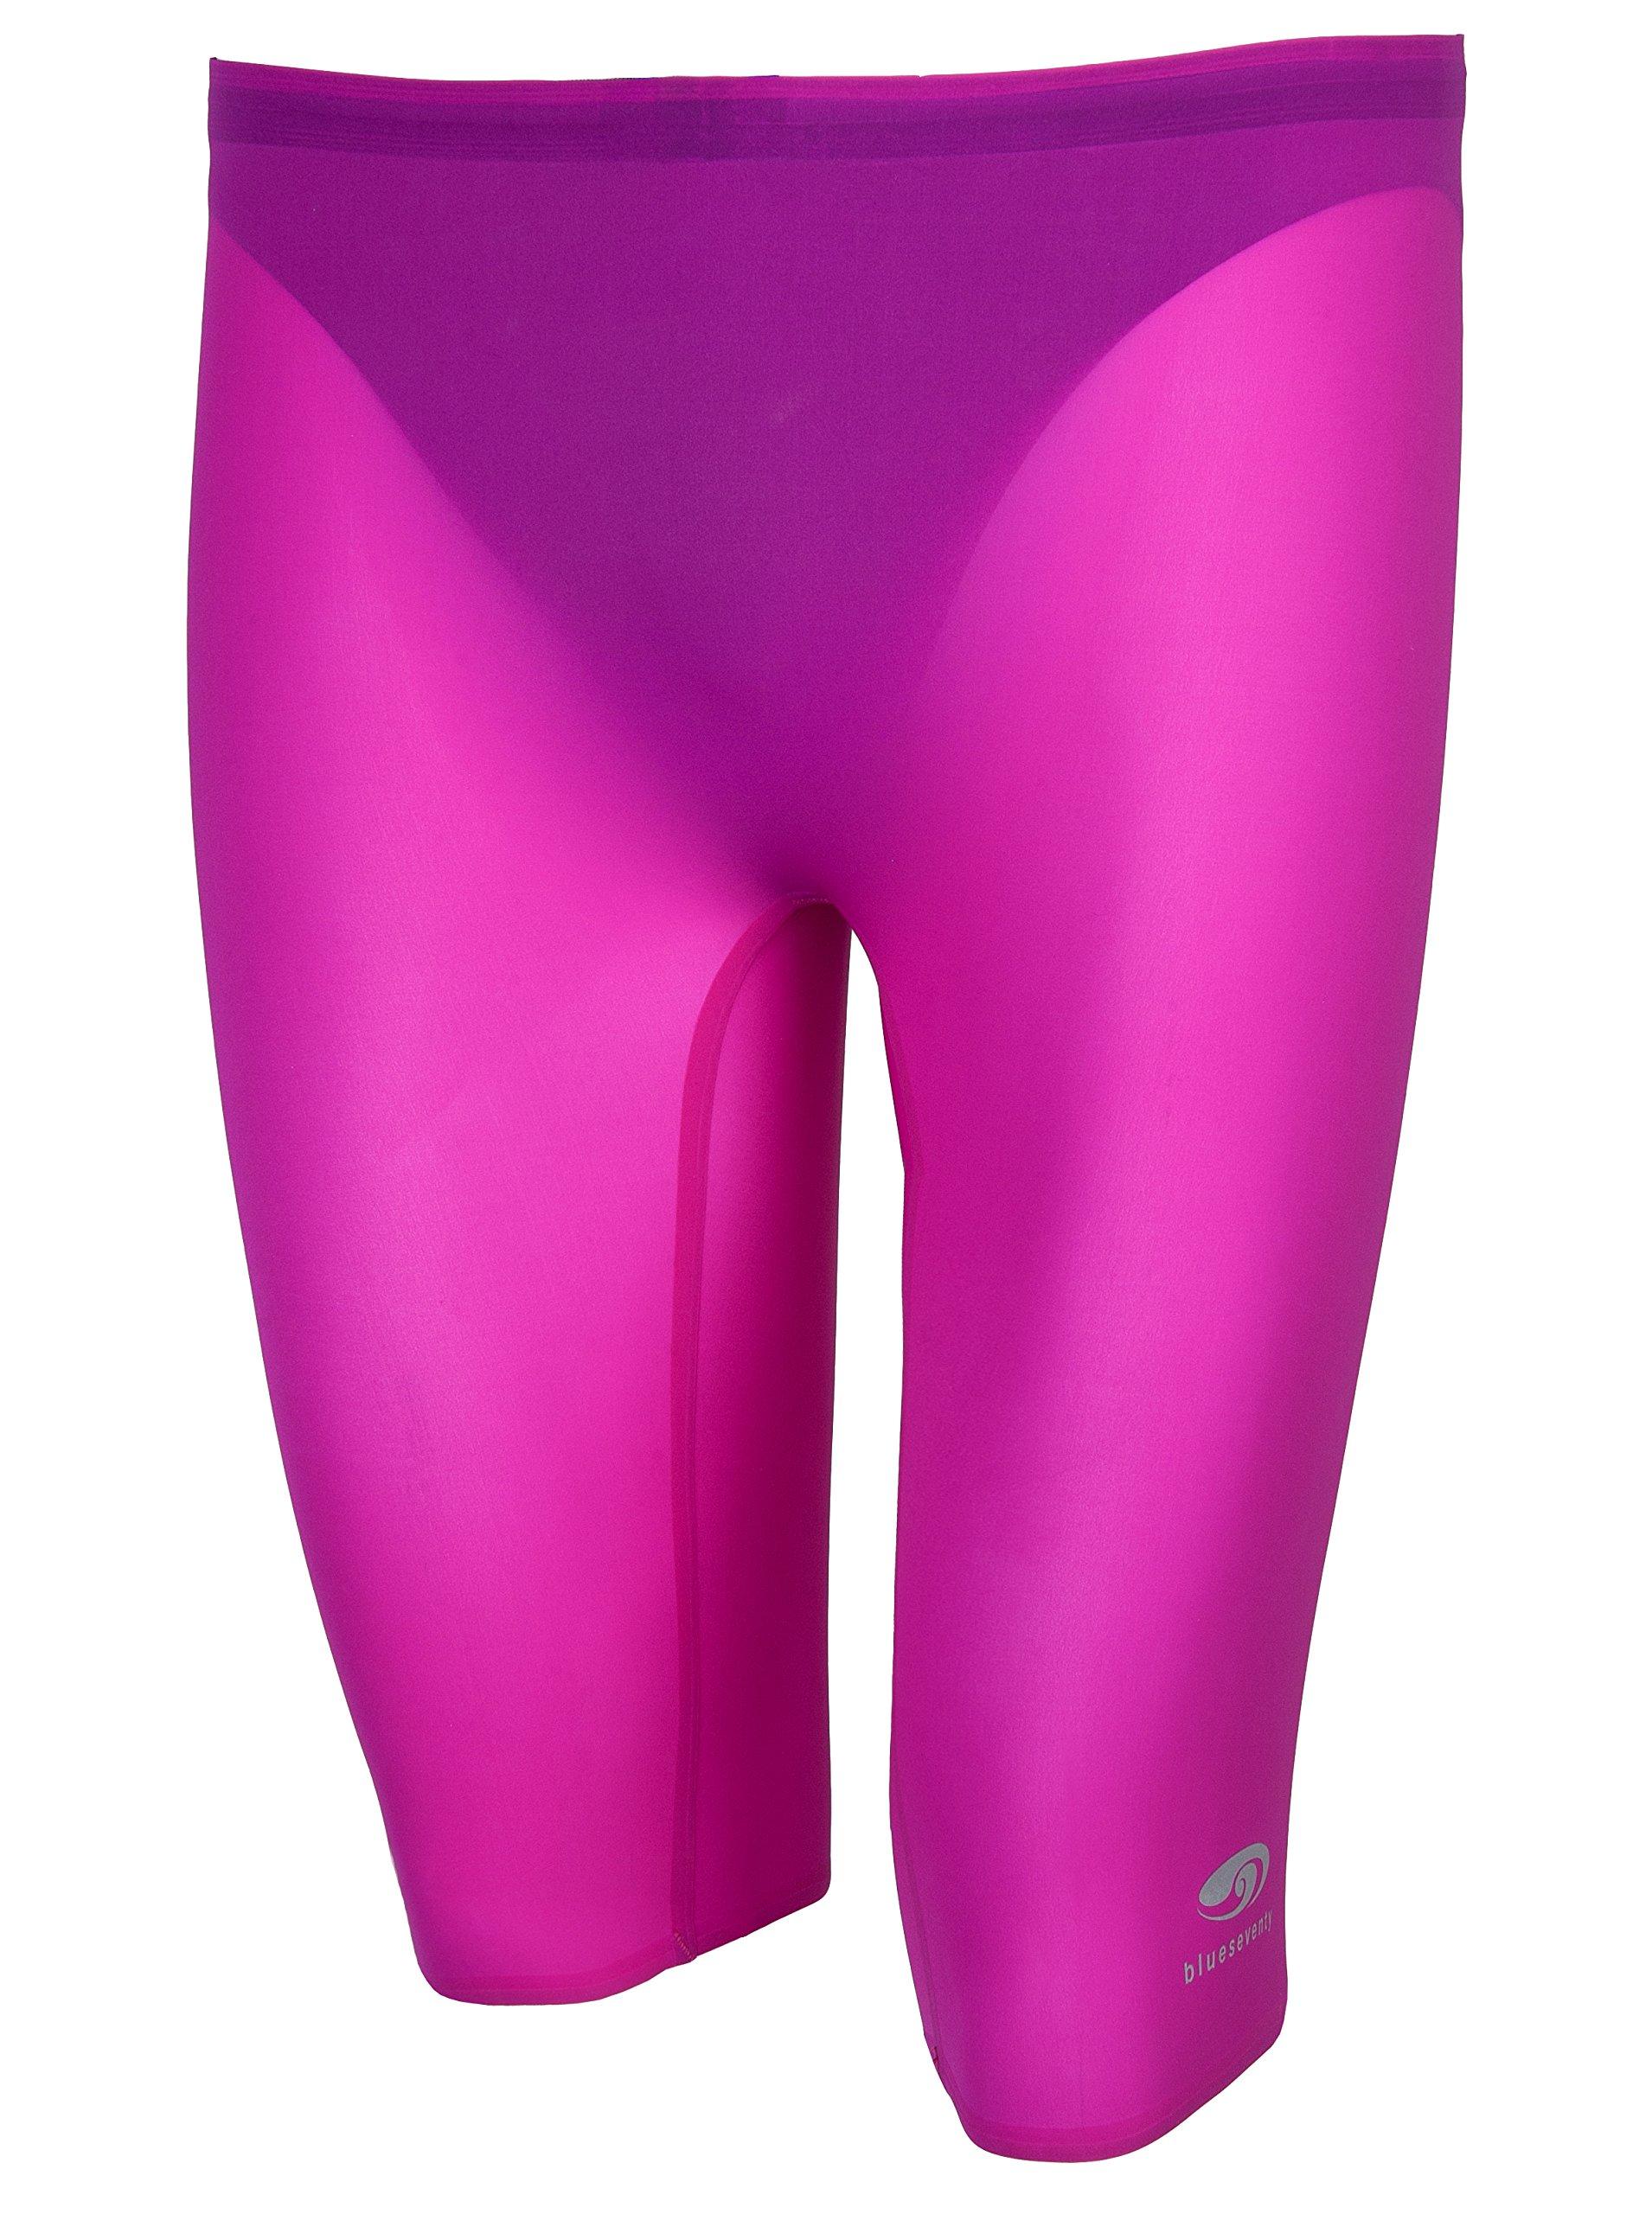 blueseventy neroTX Jammer - Swim Racing Tech Suit - FINA Approved